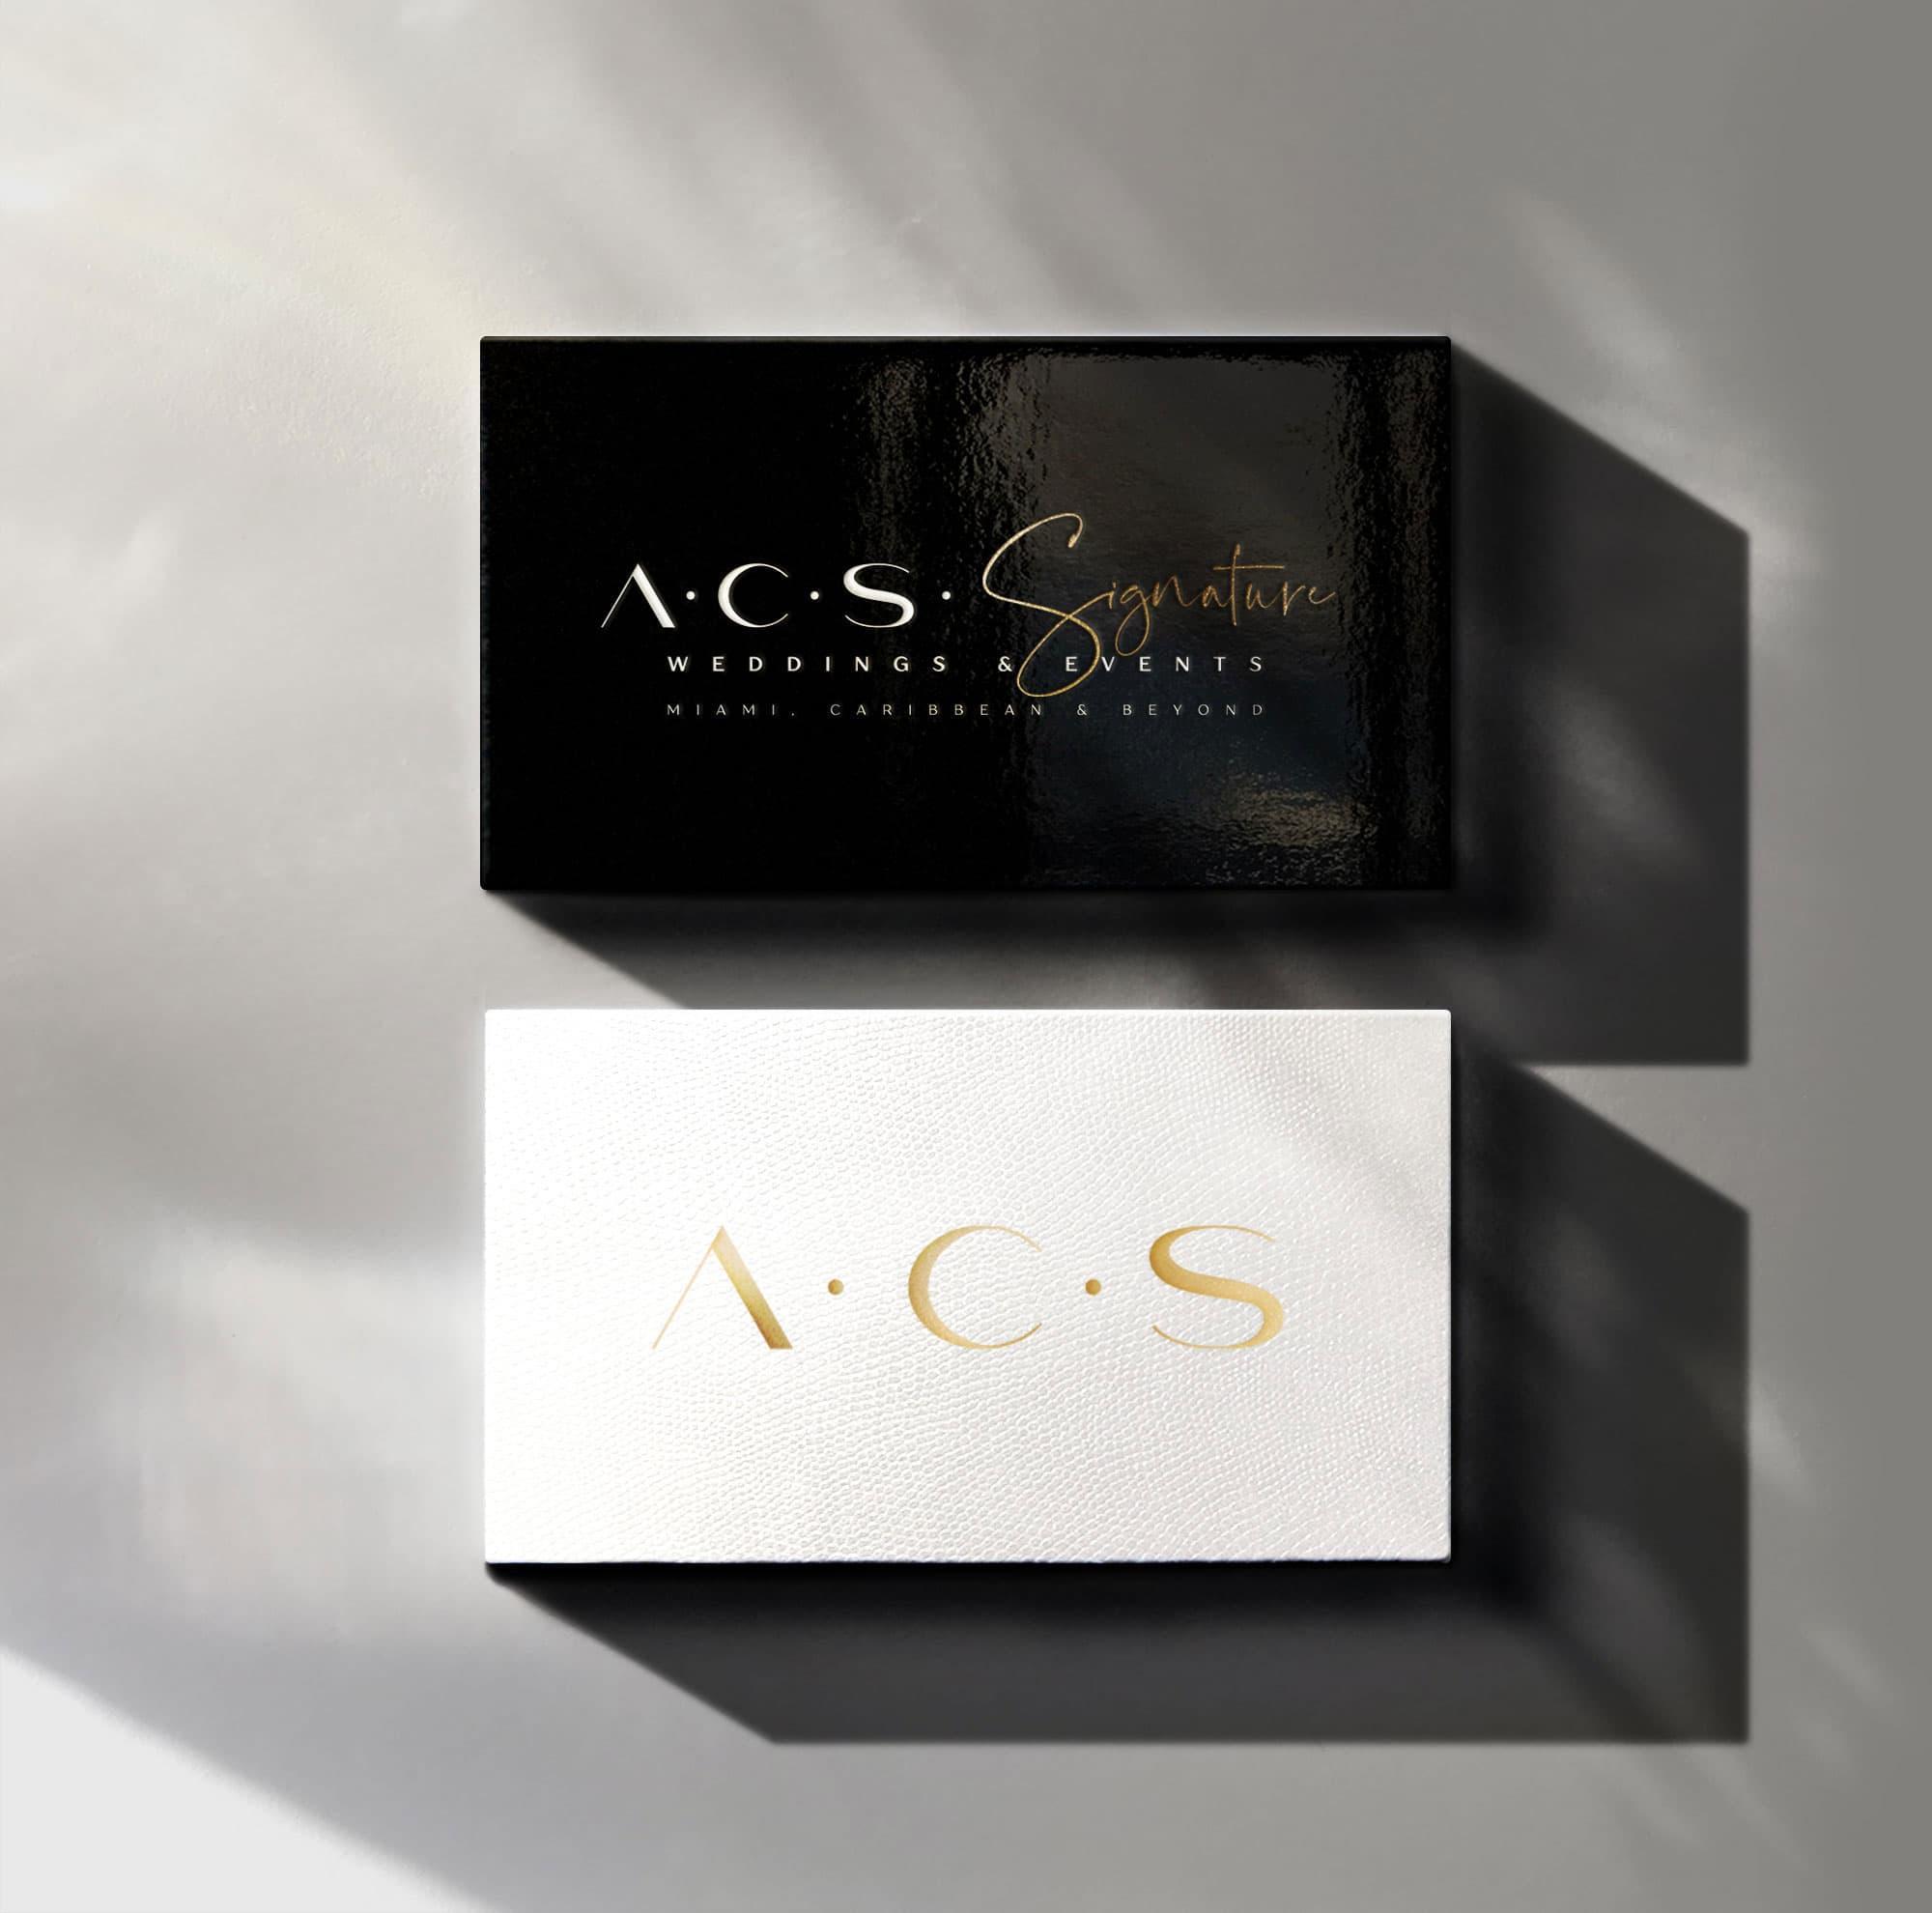 ACS-Branding-and-Website-Design-for-High-End-Event-Planner-Custom-Business-Card-Design